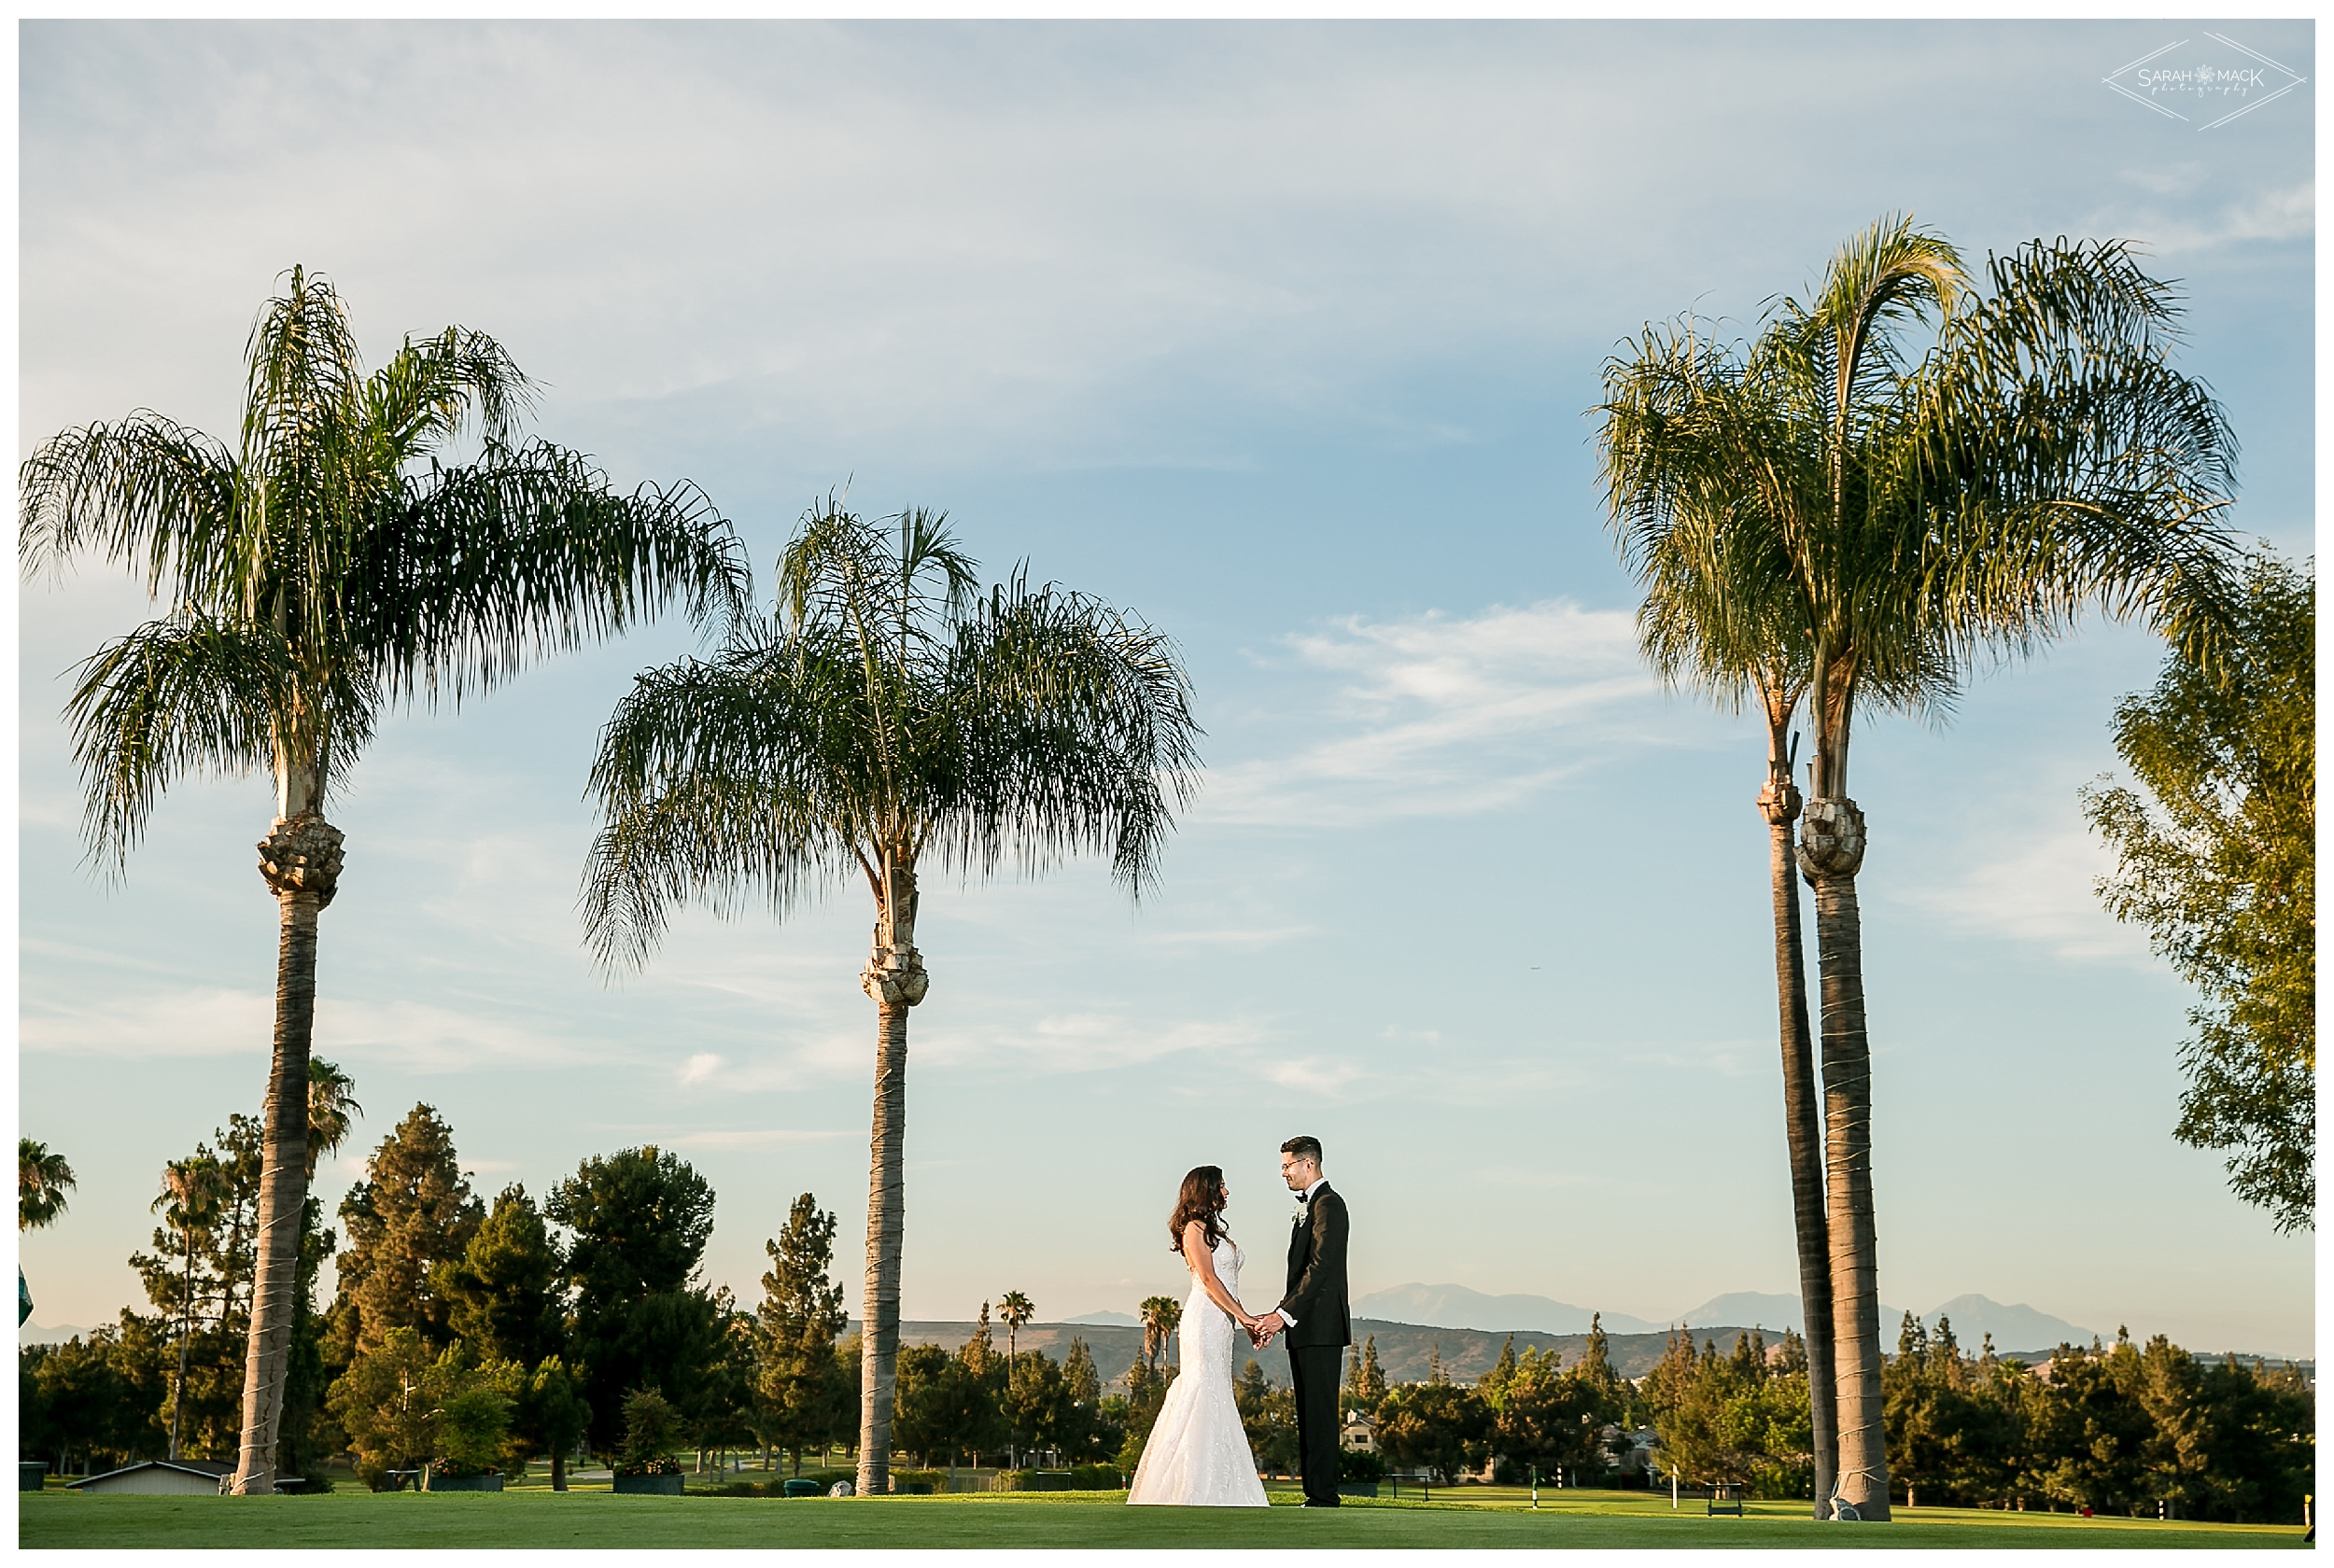 IA-Alta-Vista-Country-Club-Yorba-Linda-Wedding-Photography 522.jpg